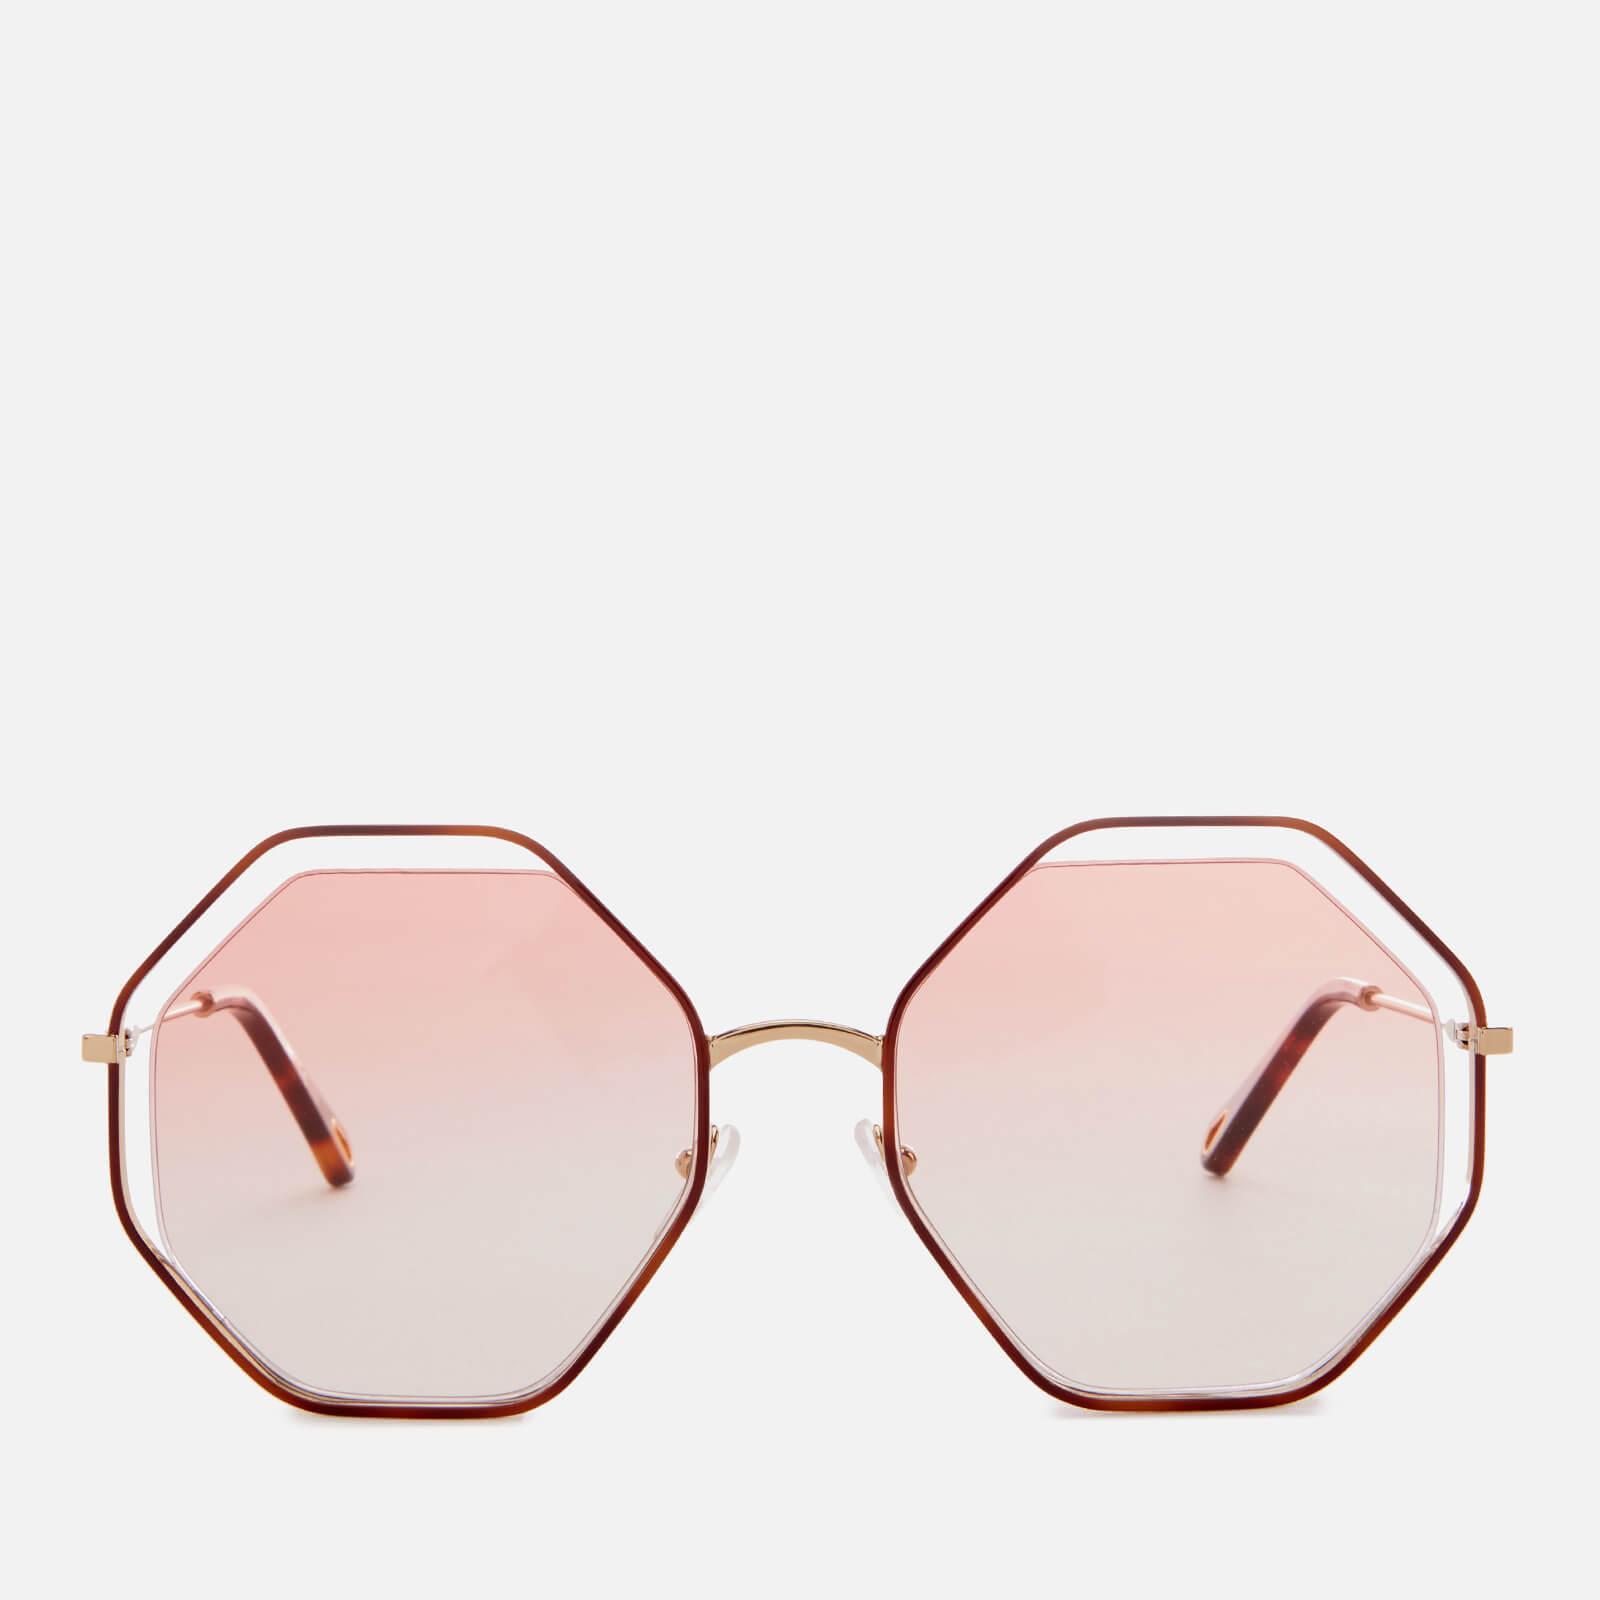 1772ed07b6c Chloé Poppy Octagon Frame Sunglasses - Save 5% - Lyst